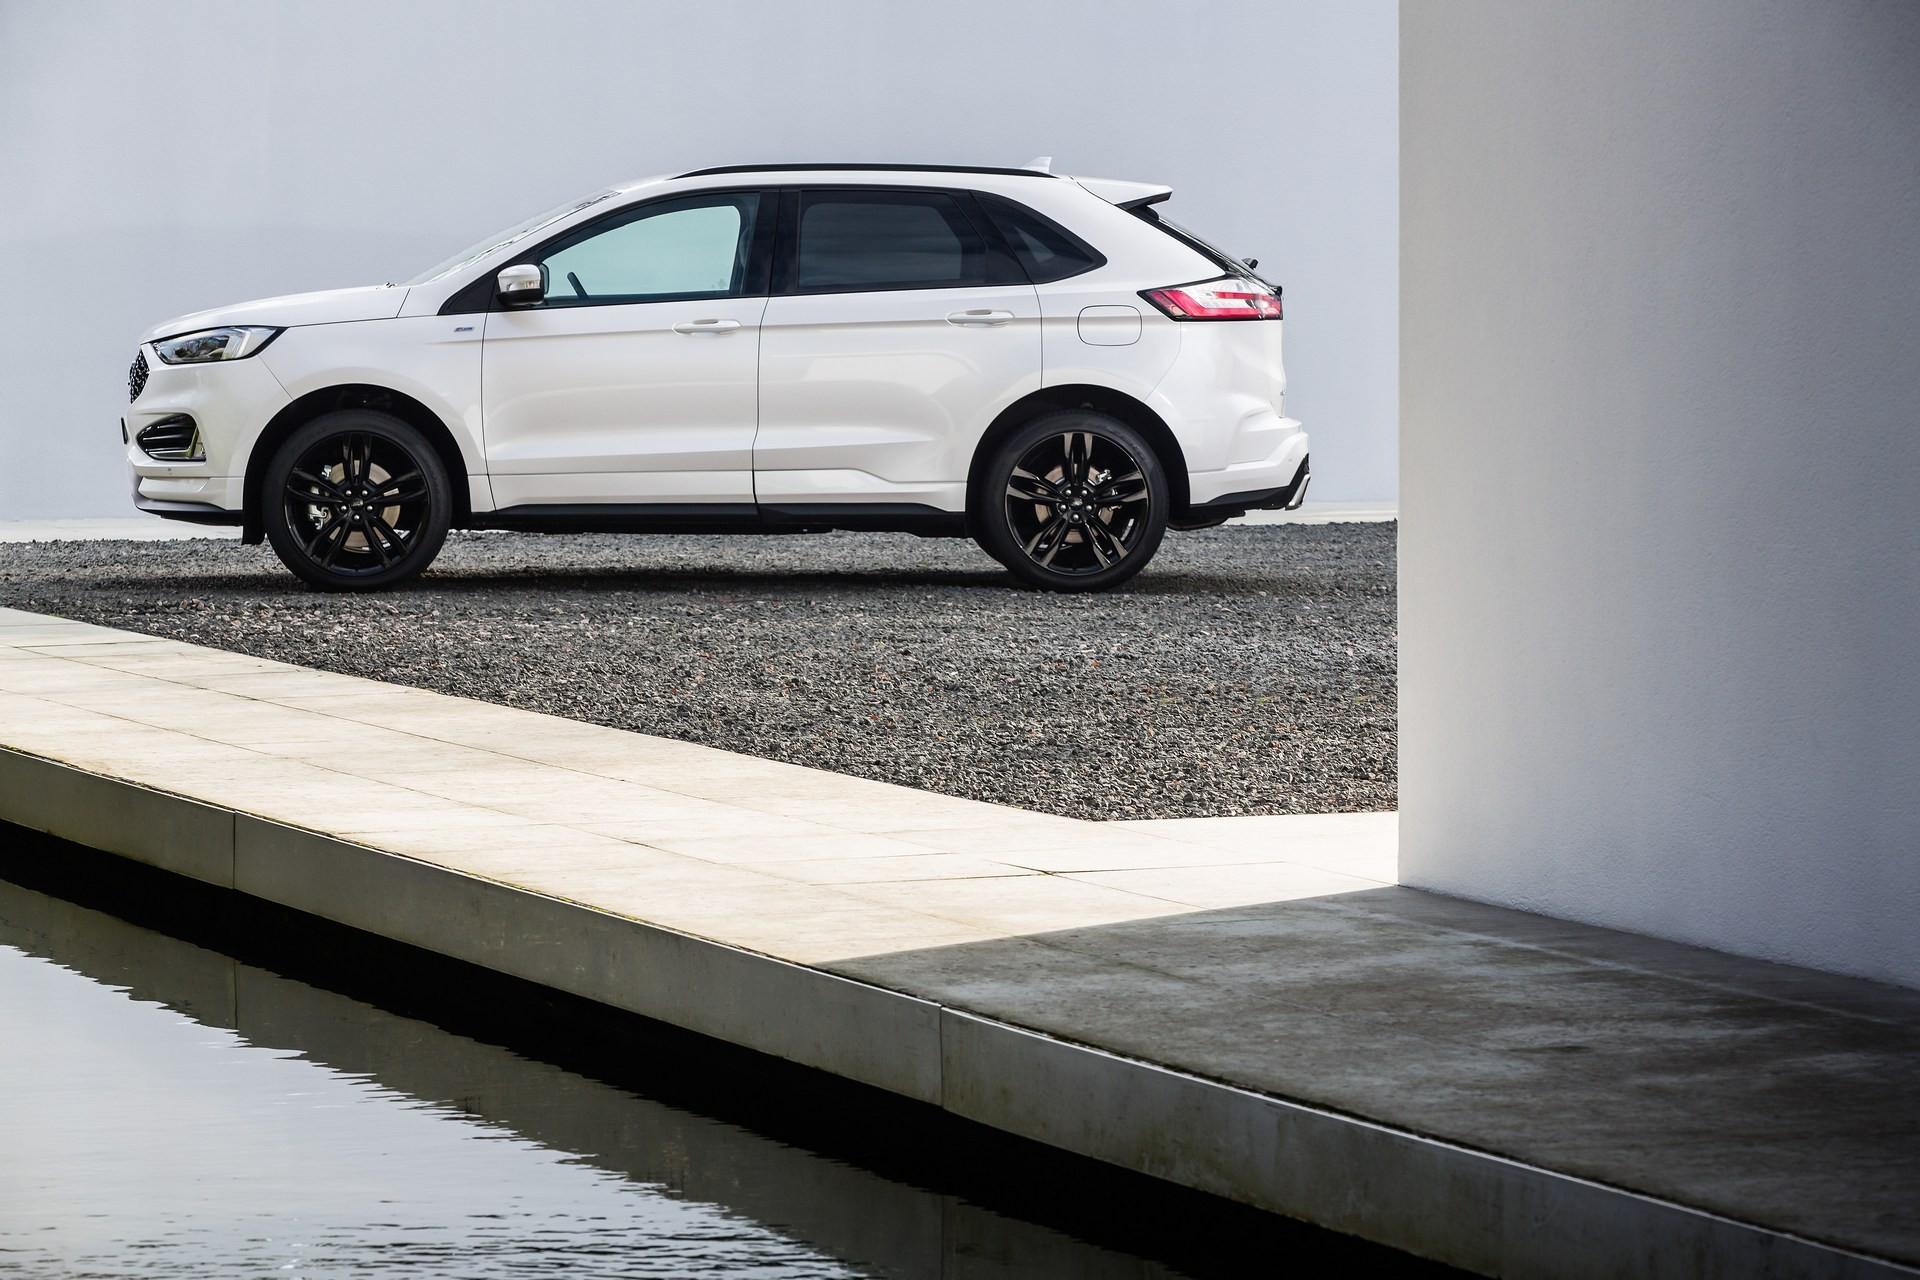 2019 Ford Edge Makes European Debut With Powerful EcoBlue Bi-Turbo Diesel - autoevolution